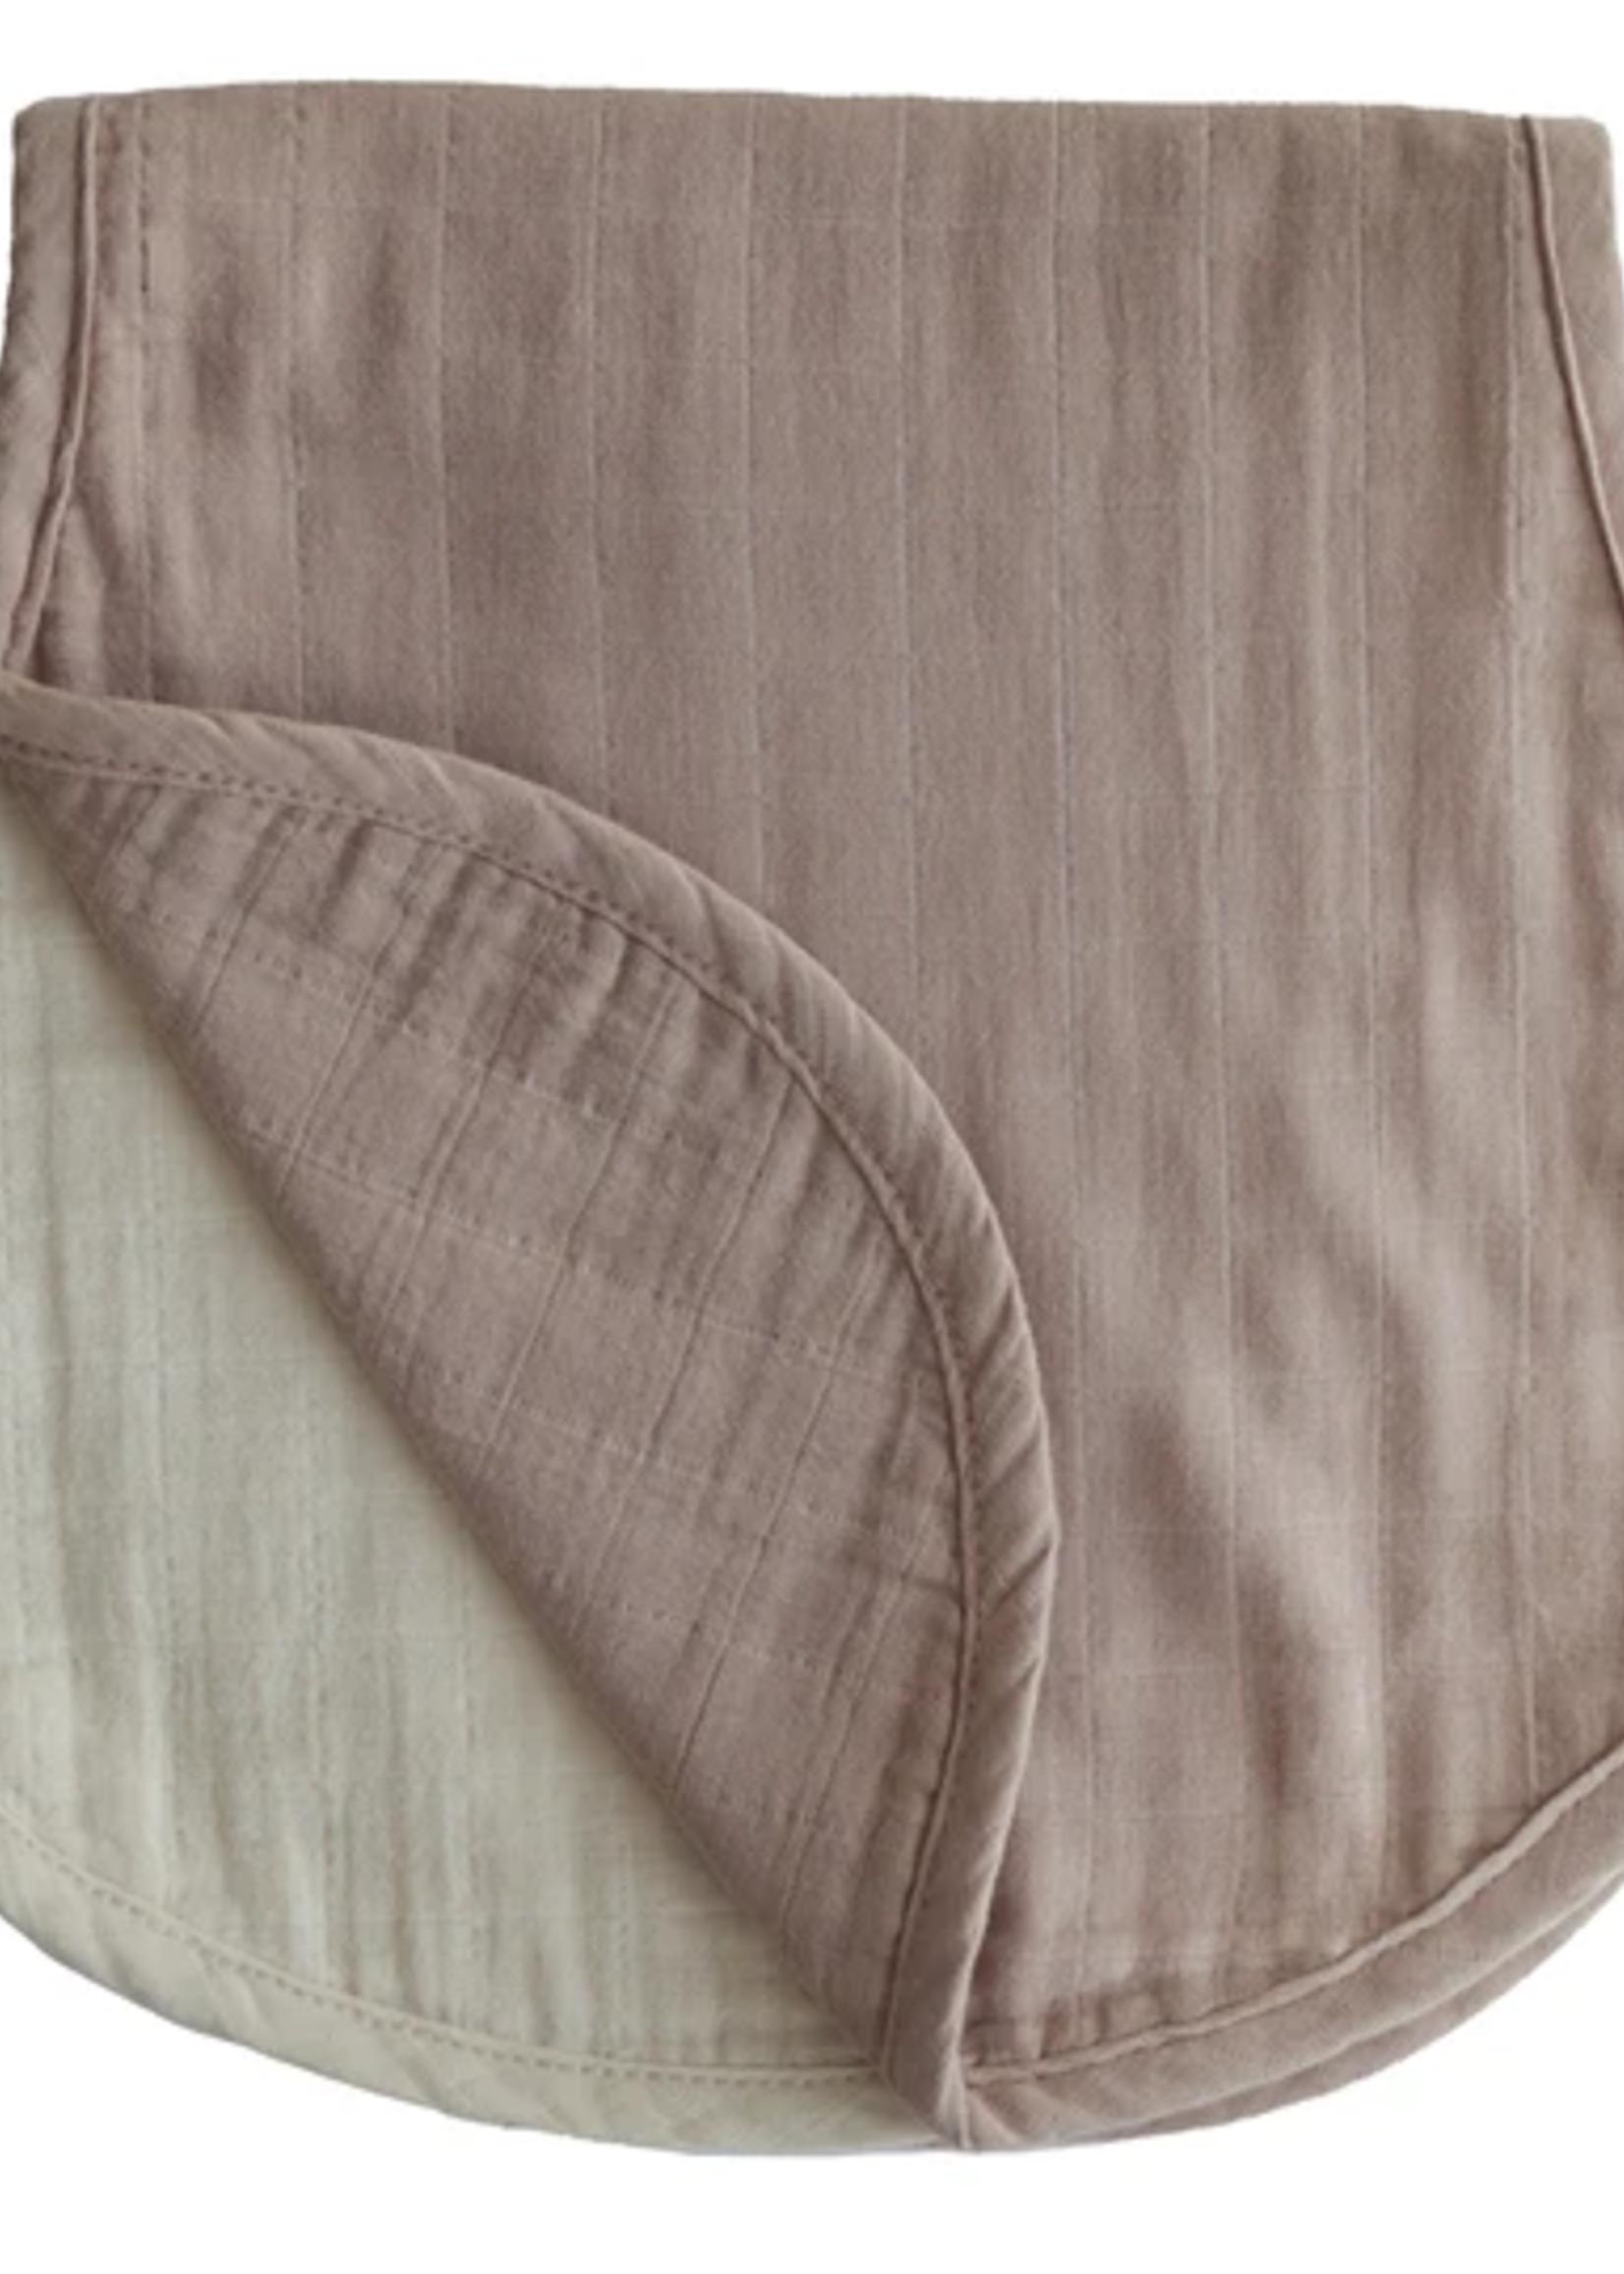 Elitaire Petite Muslin 2-Pack Burp Cloth in Natural/Fog